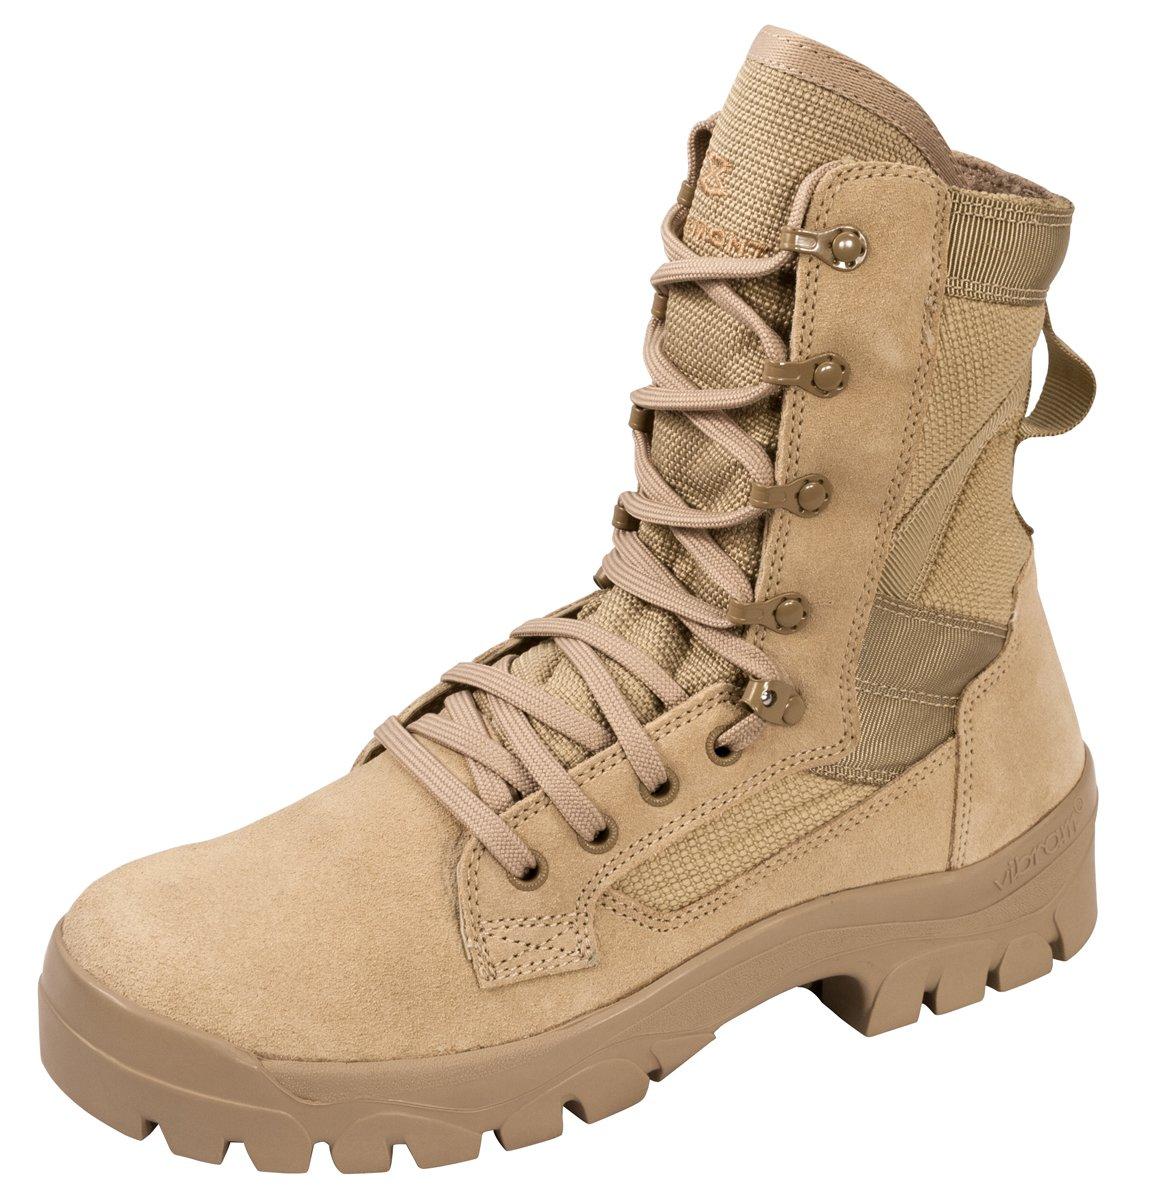 Garmont T8 Bifida Tactical Boot - Desert Sand, 13 W US